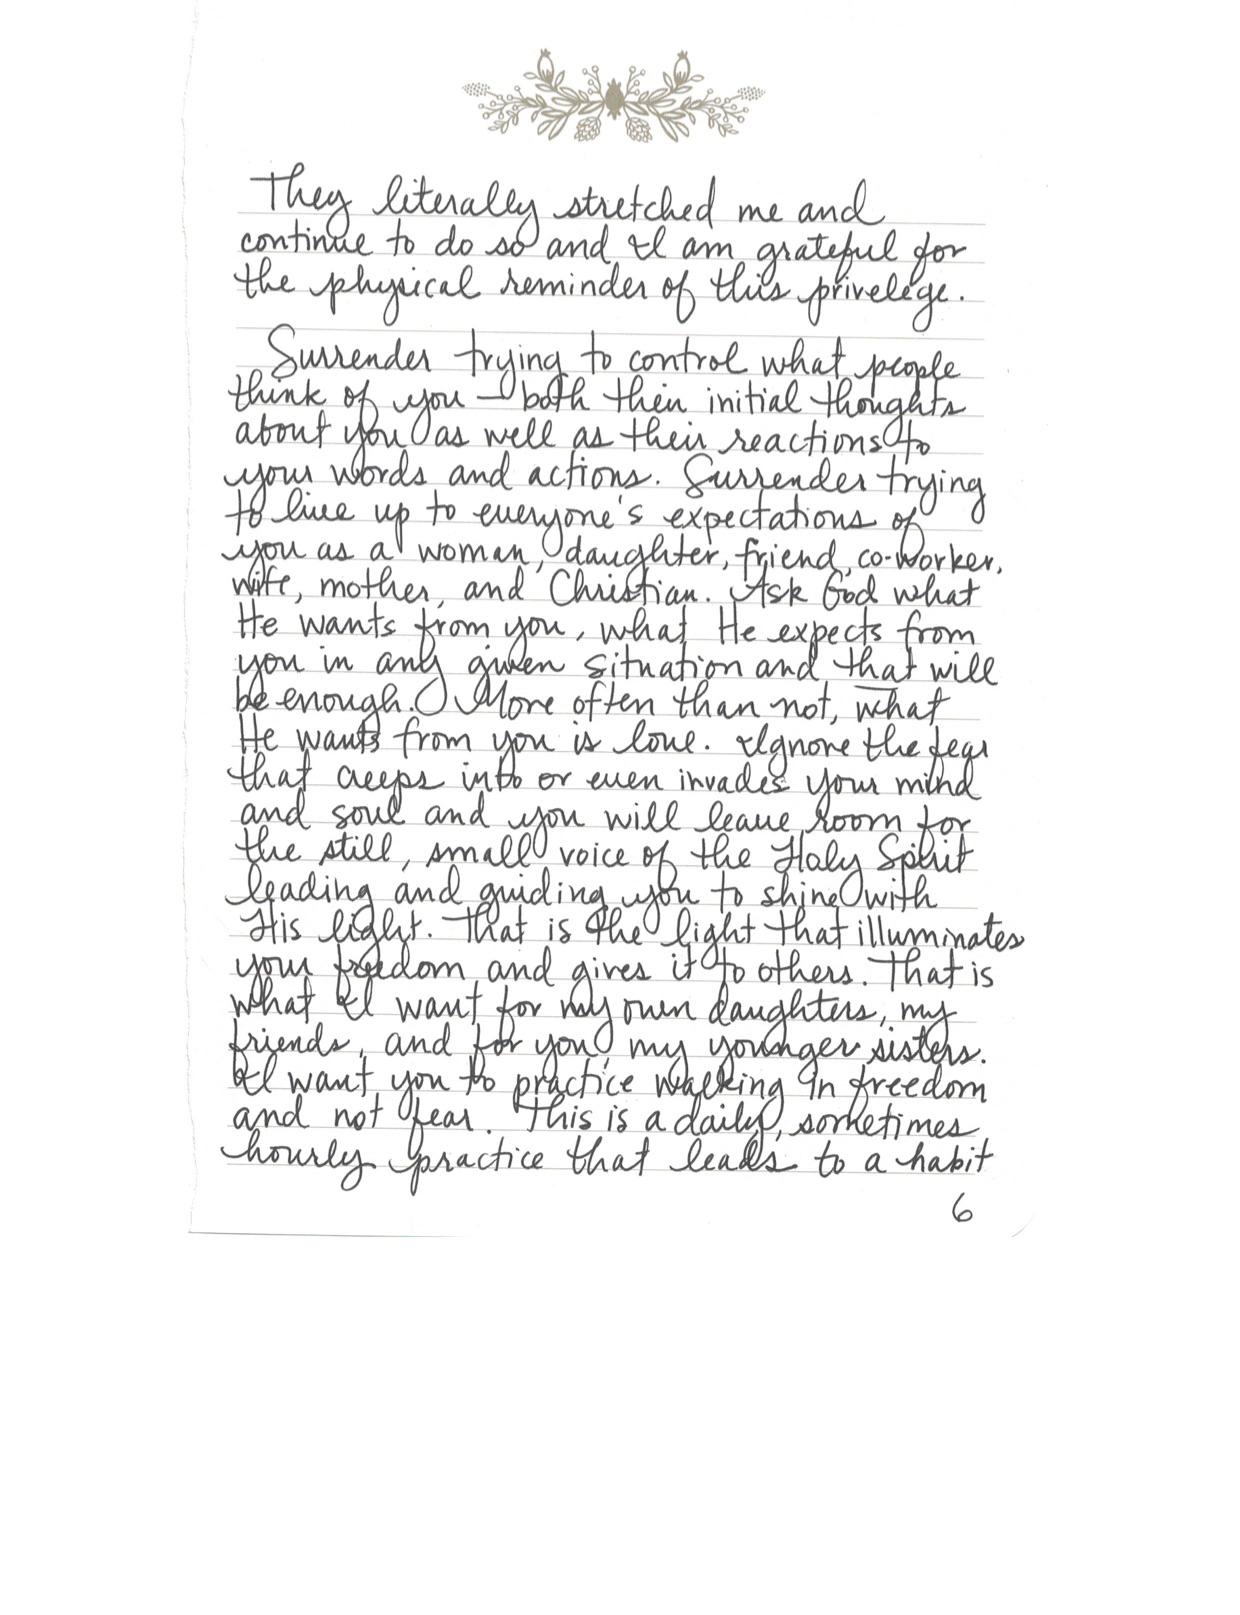 DeAnn_Malcolm_Handwritten6.jpg